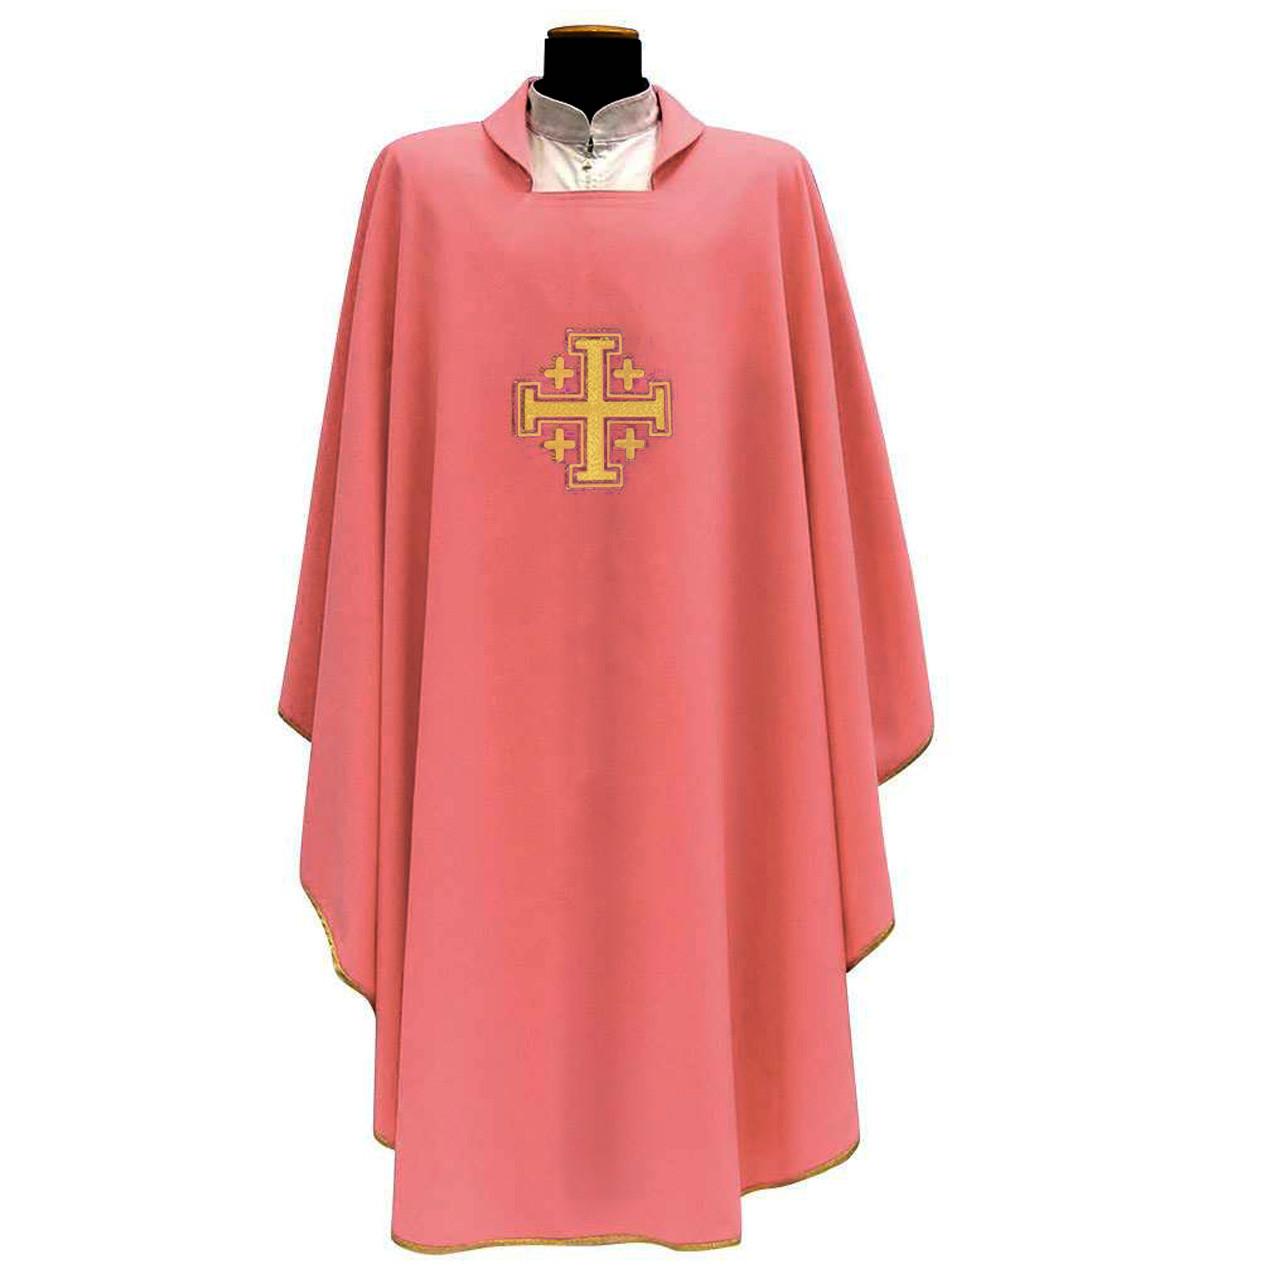 137 Chasuble in Rose Primavera